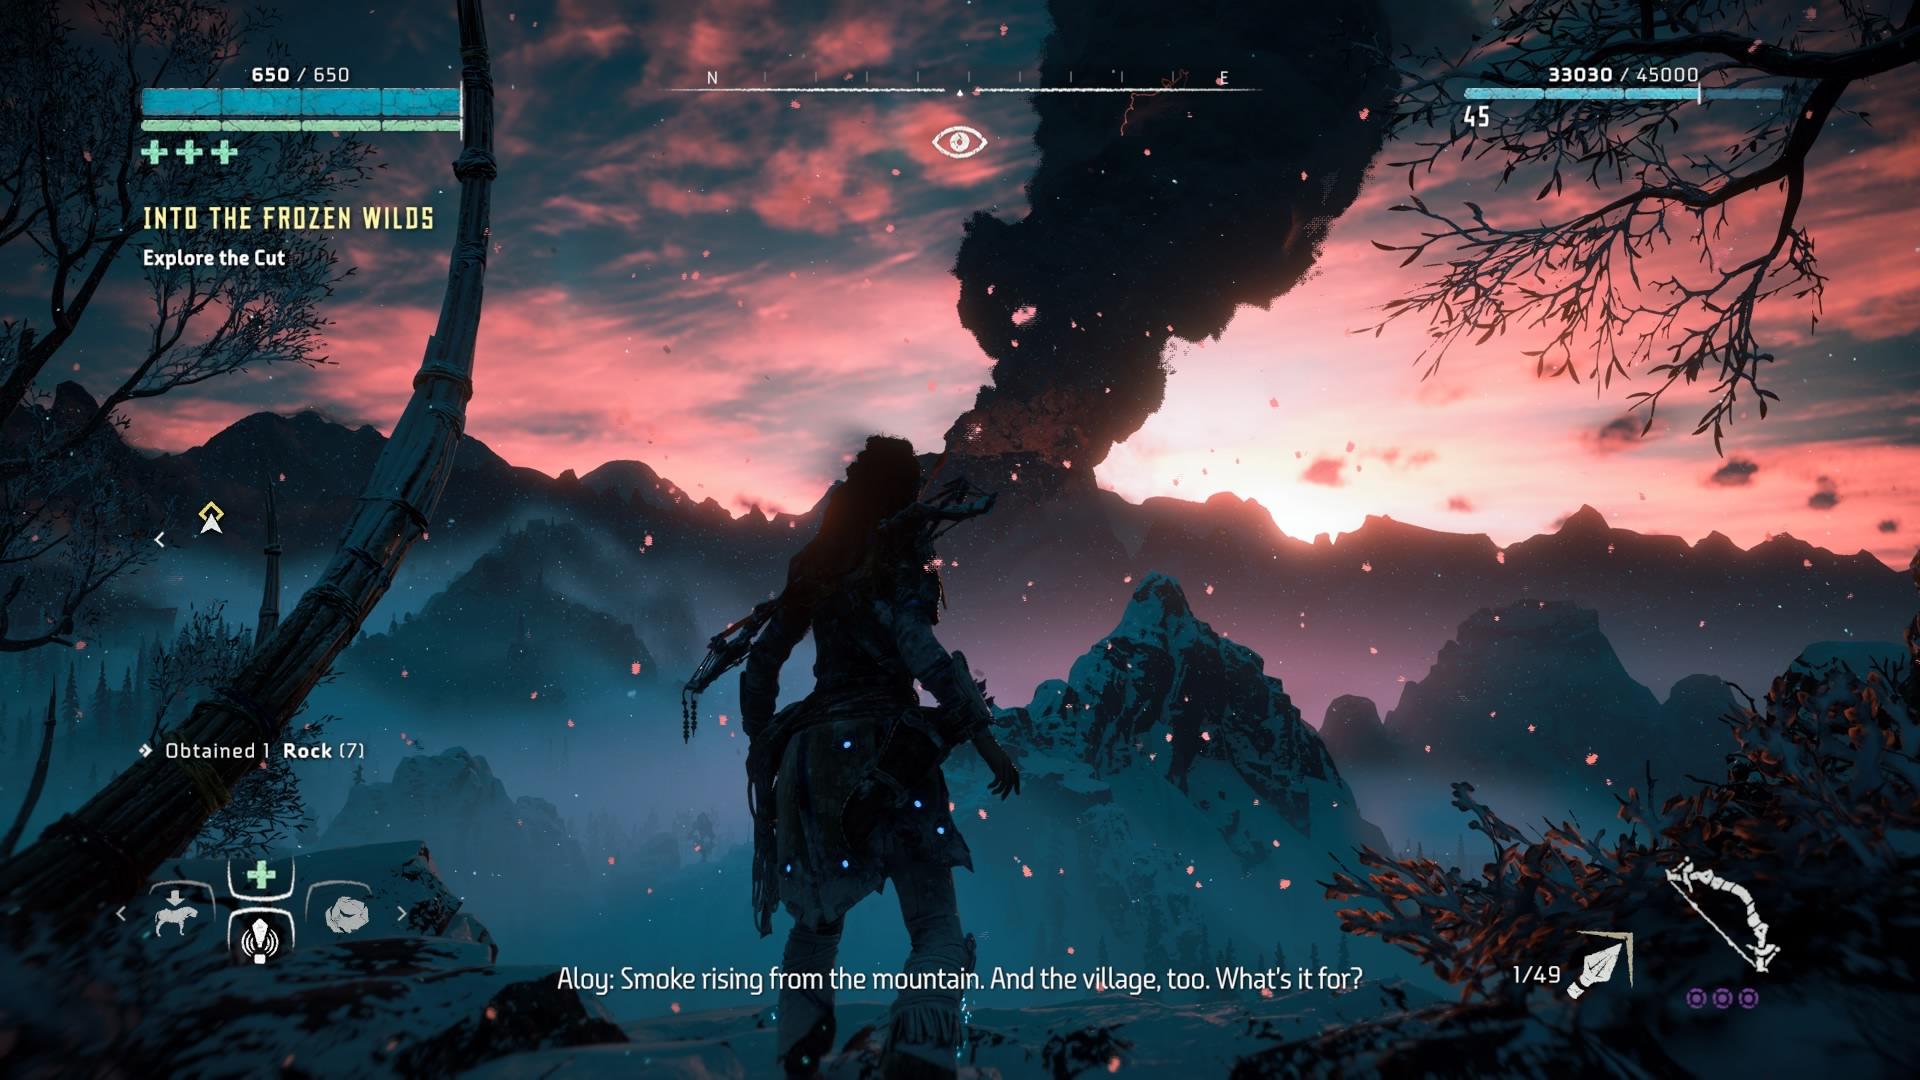 HorizonFrozenWilds_Review